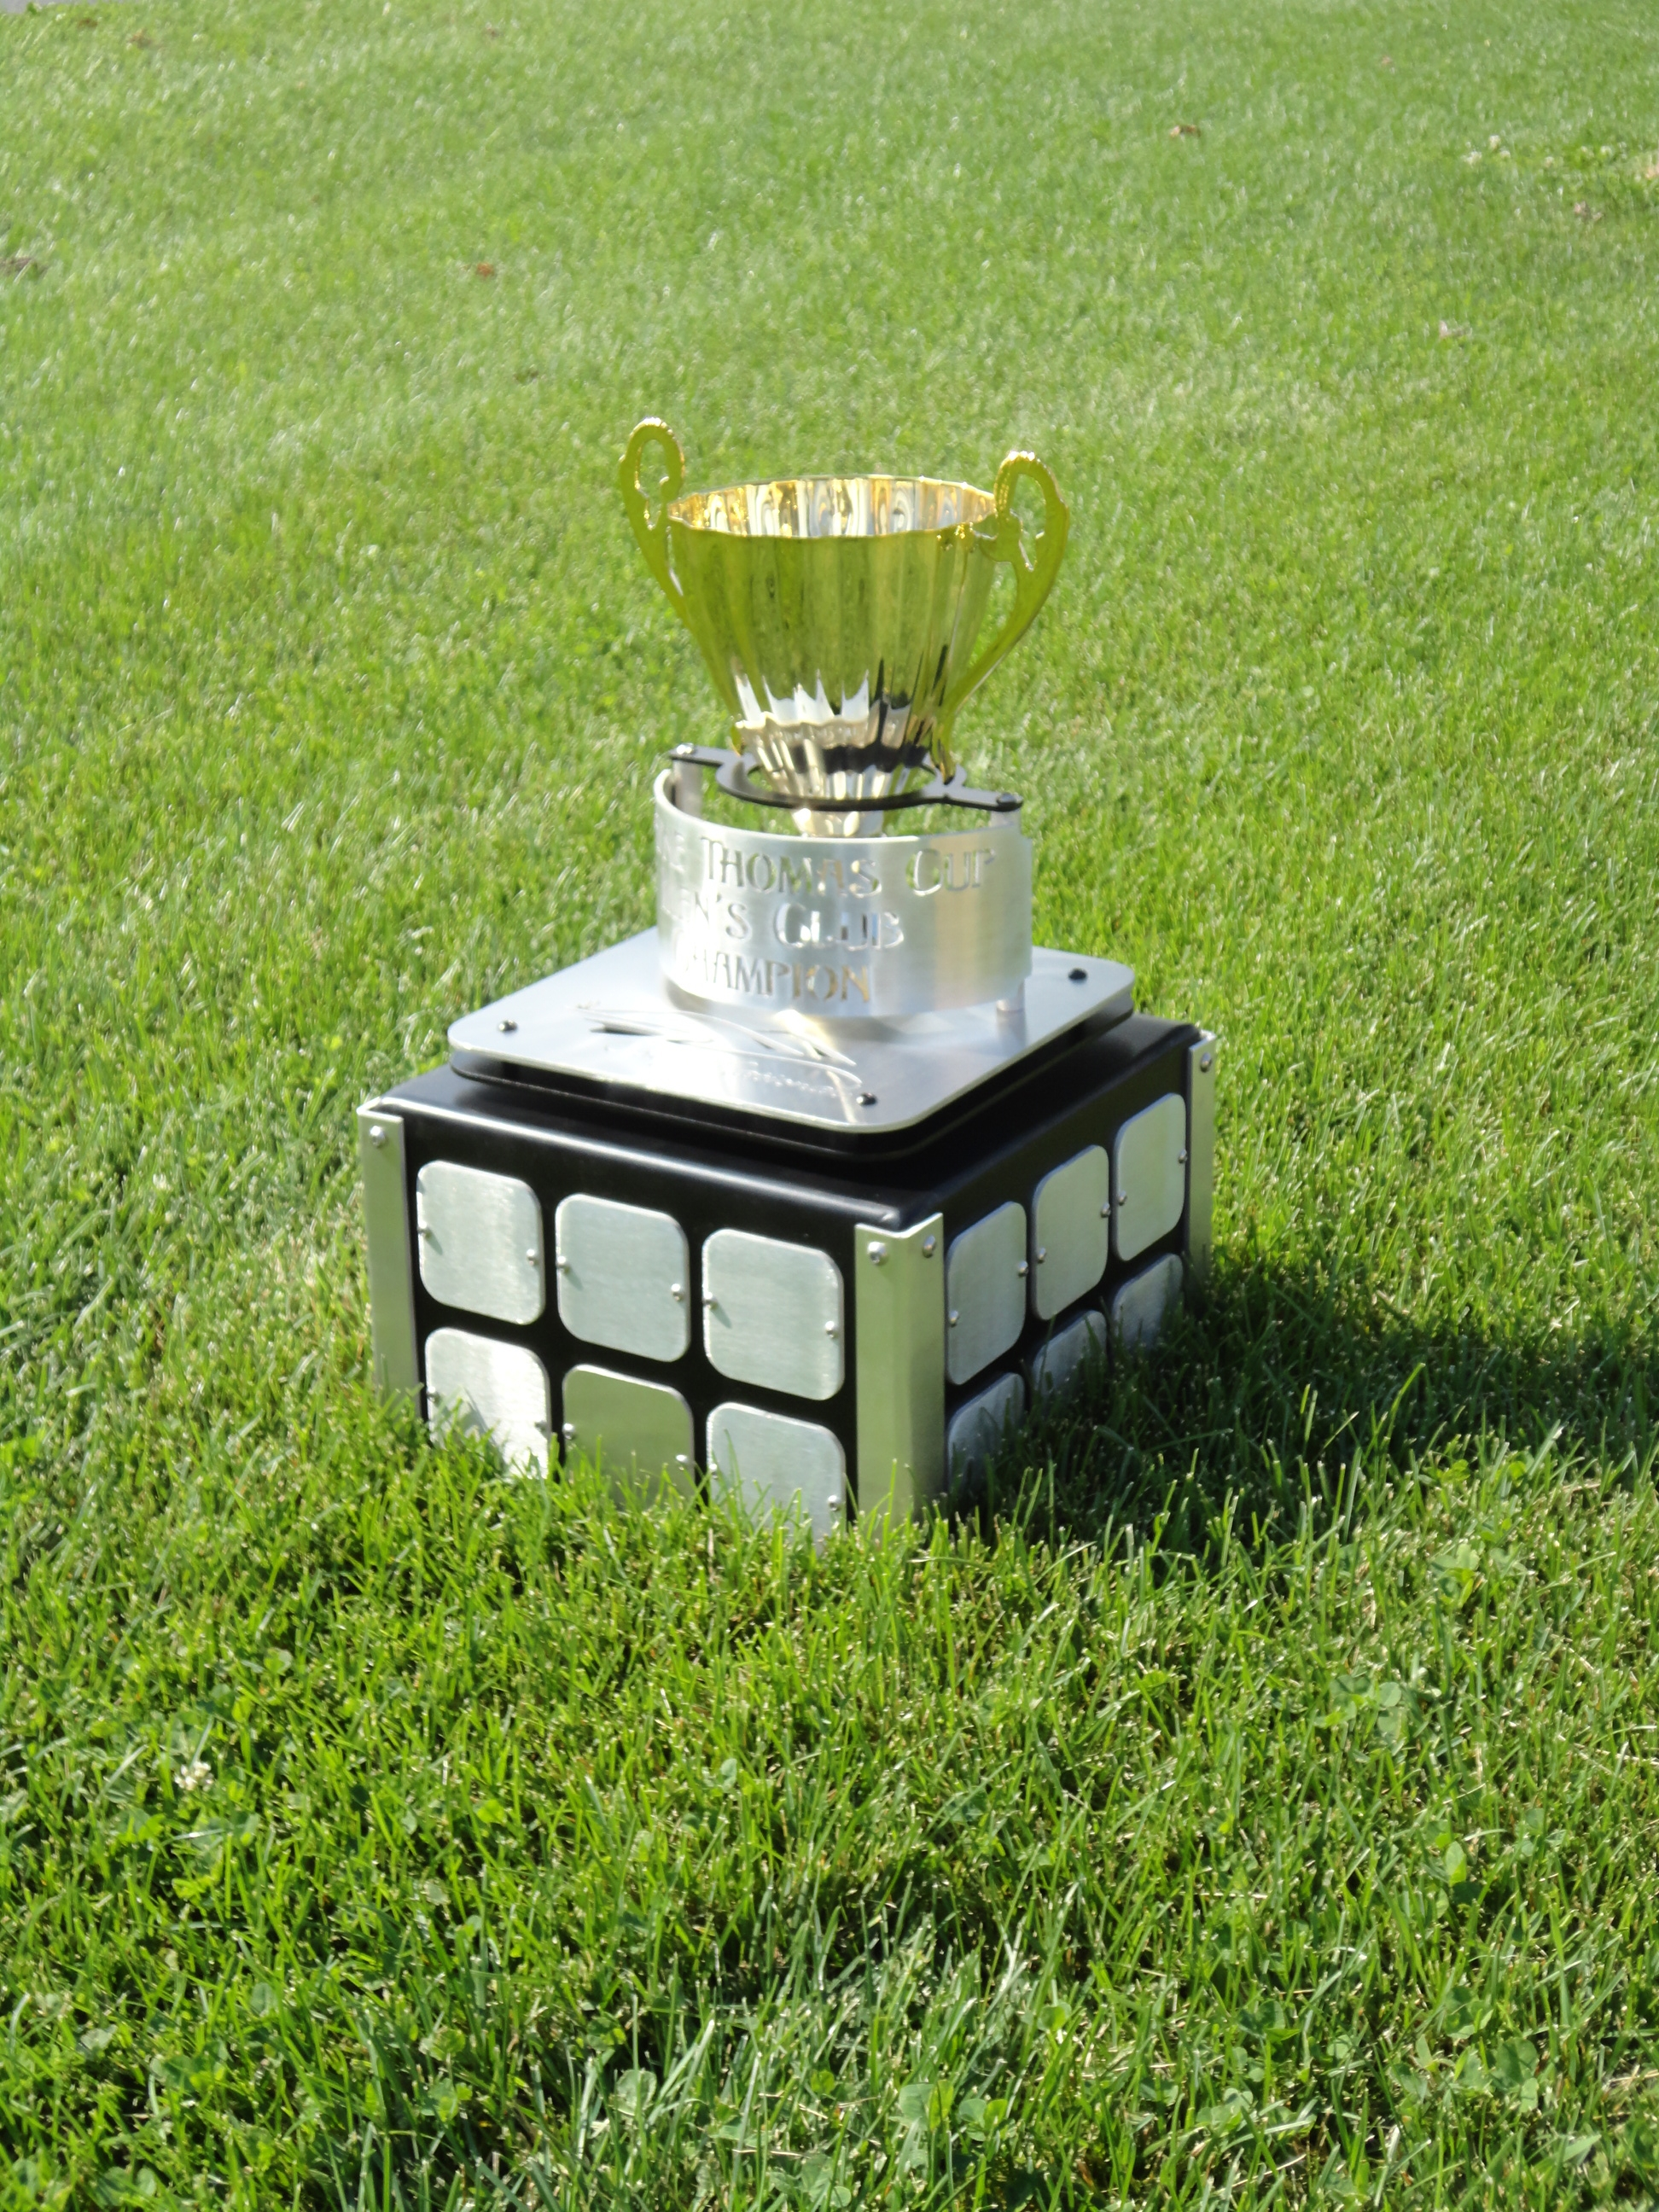 cup-trophy-osage-national